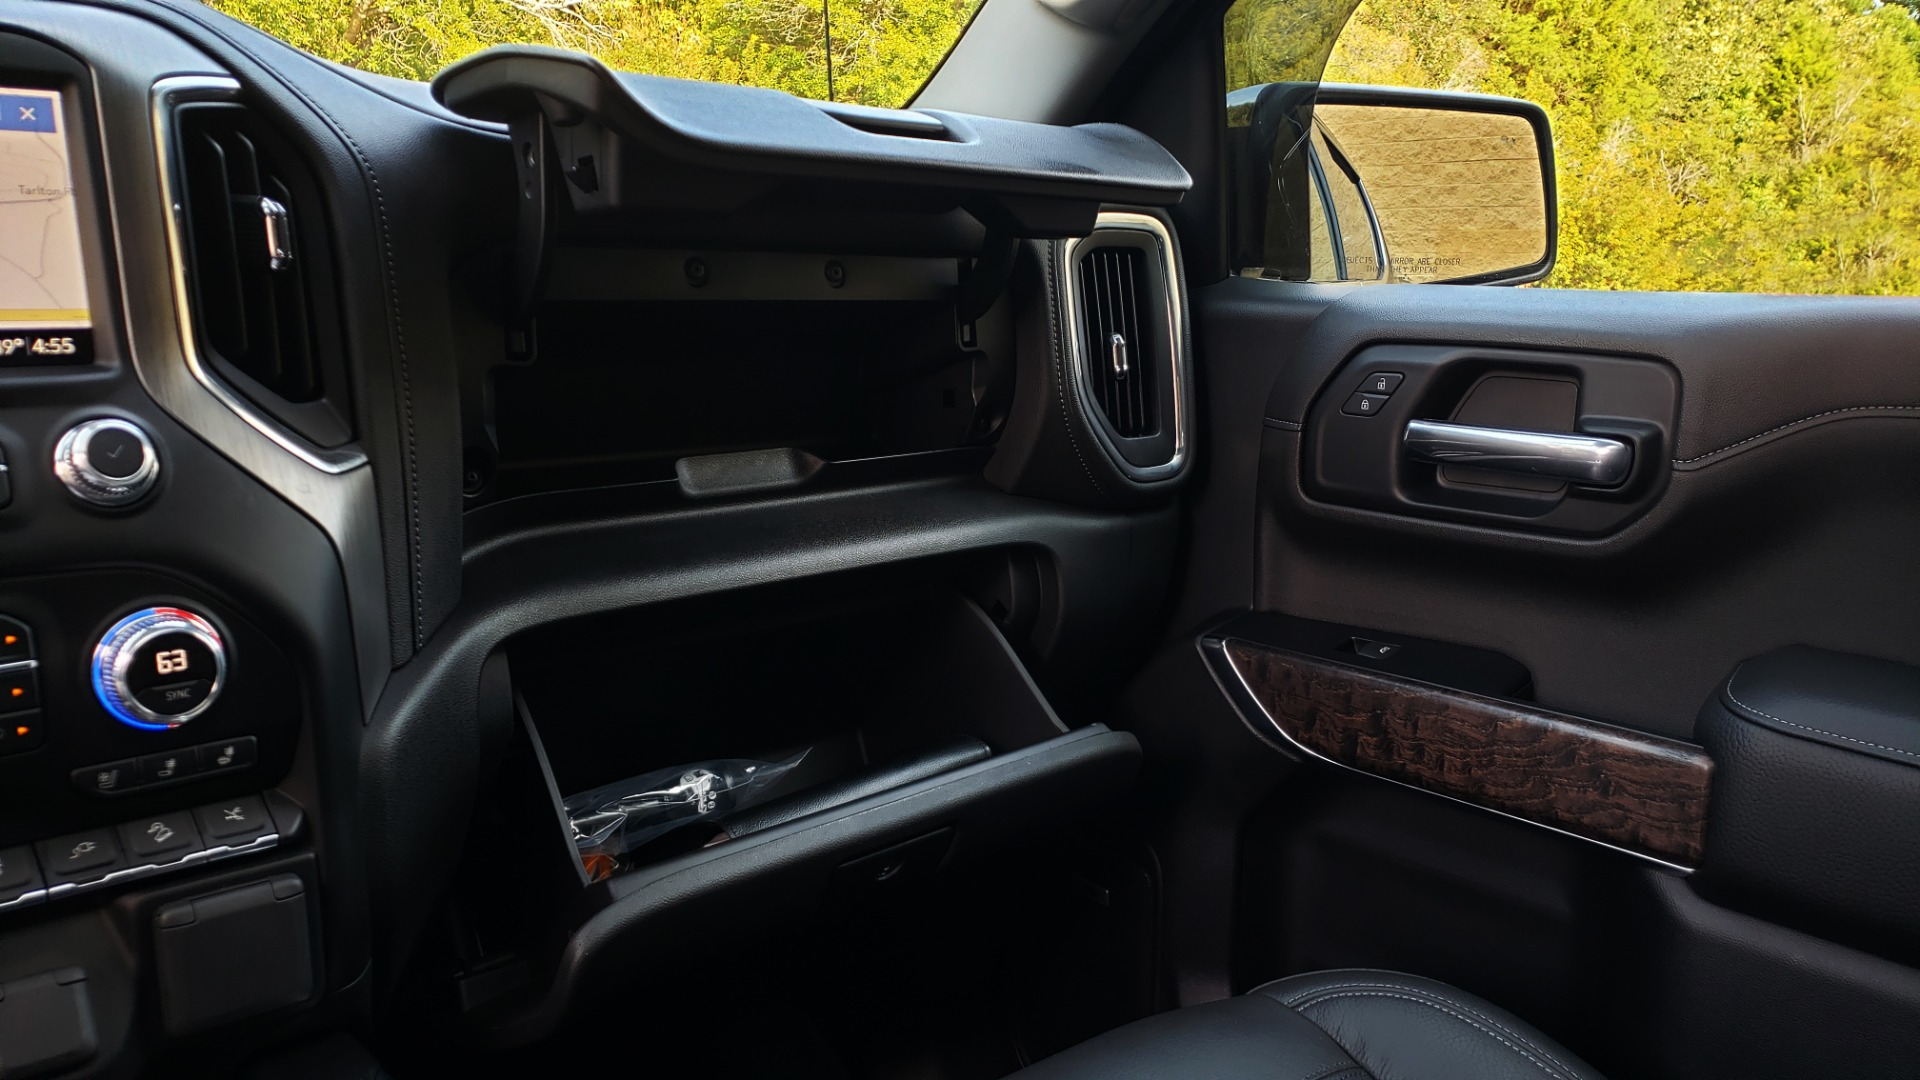 Used 2019 GMC SIERRA 1500 DENALI ULTIMATE 4WD / NAV / TECH PKG / DRVR ALRT for sale Sold at Formula Imports in Charlotte NC 28227 56